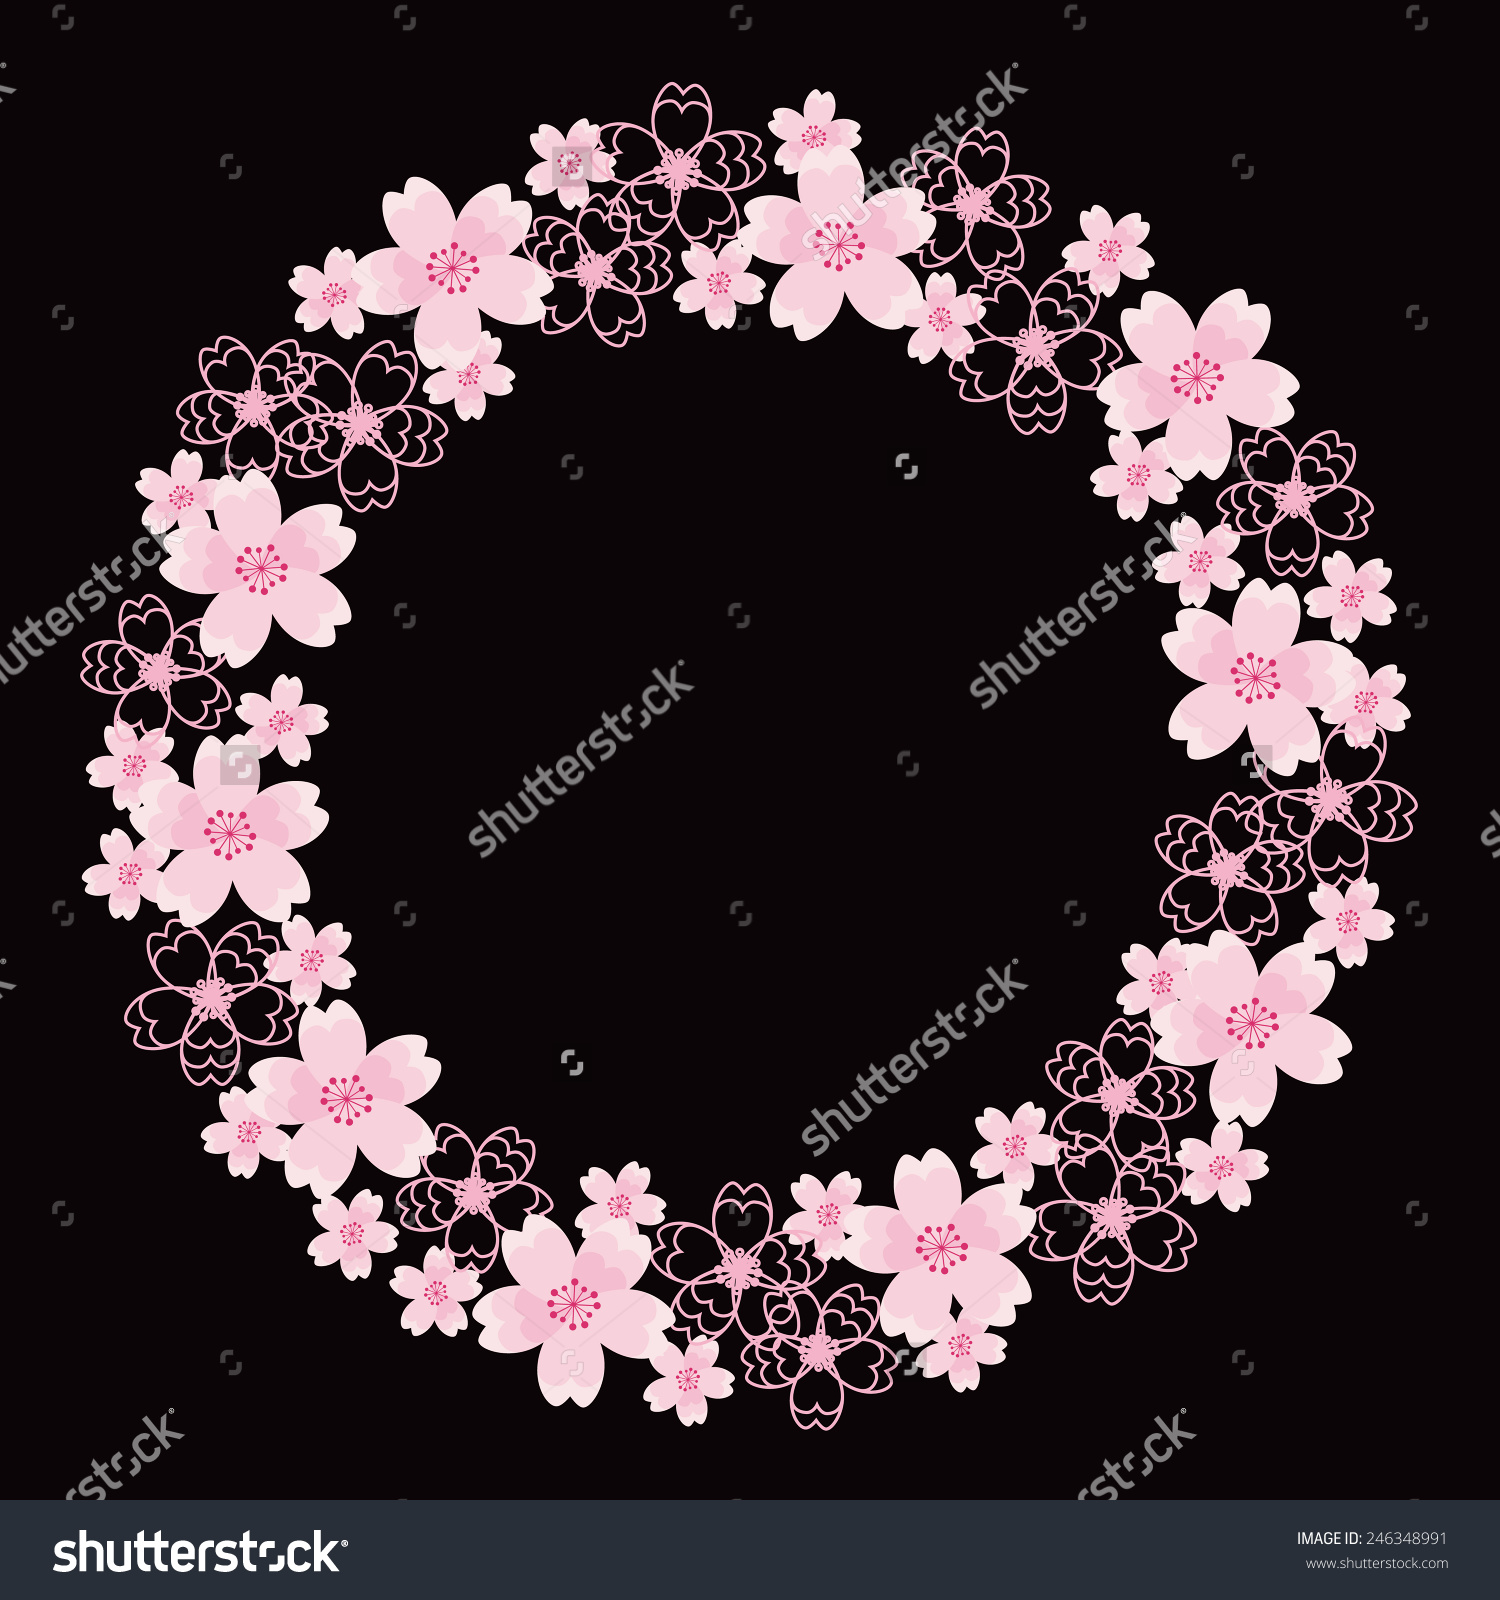 Cherry Blossom Wreath Stock Vector Illustration 246348991.